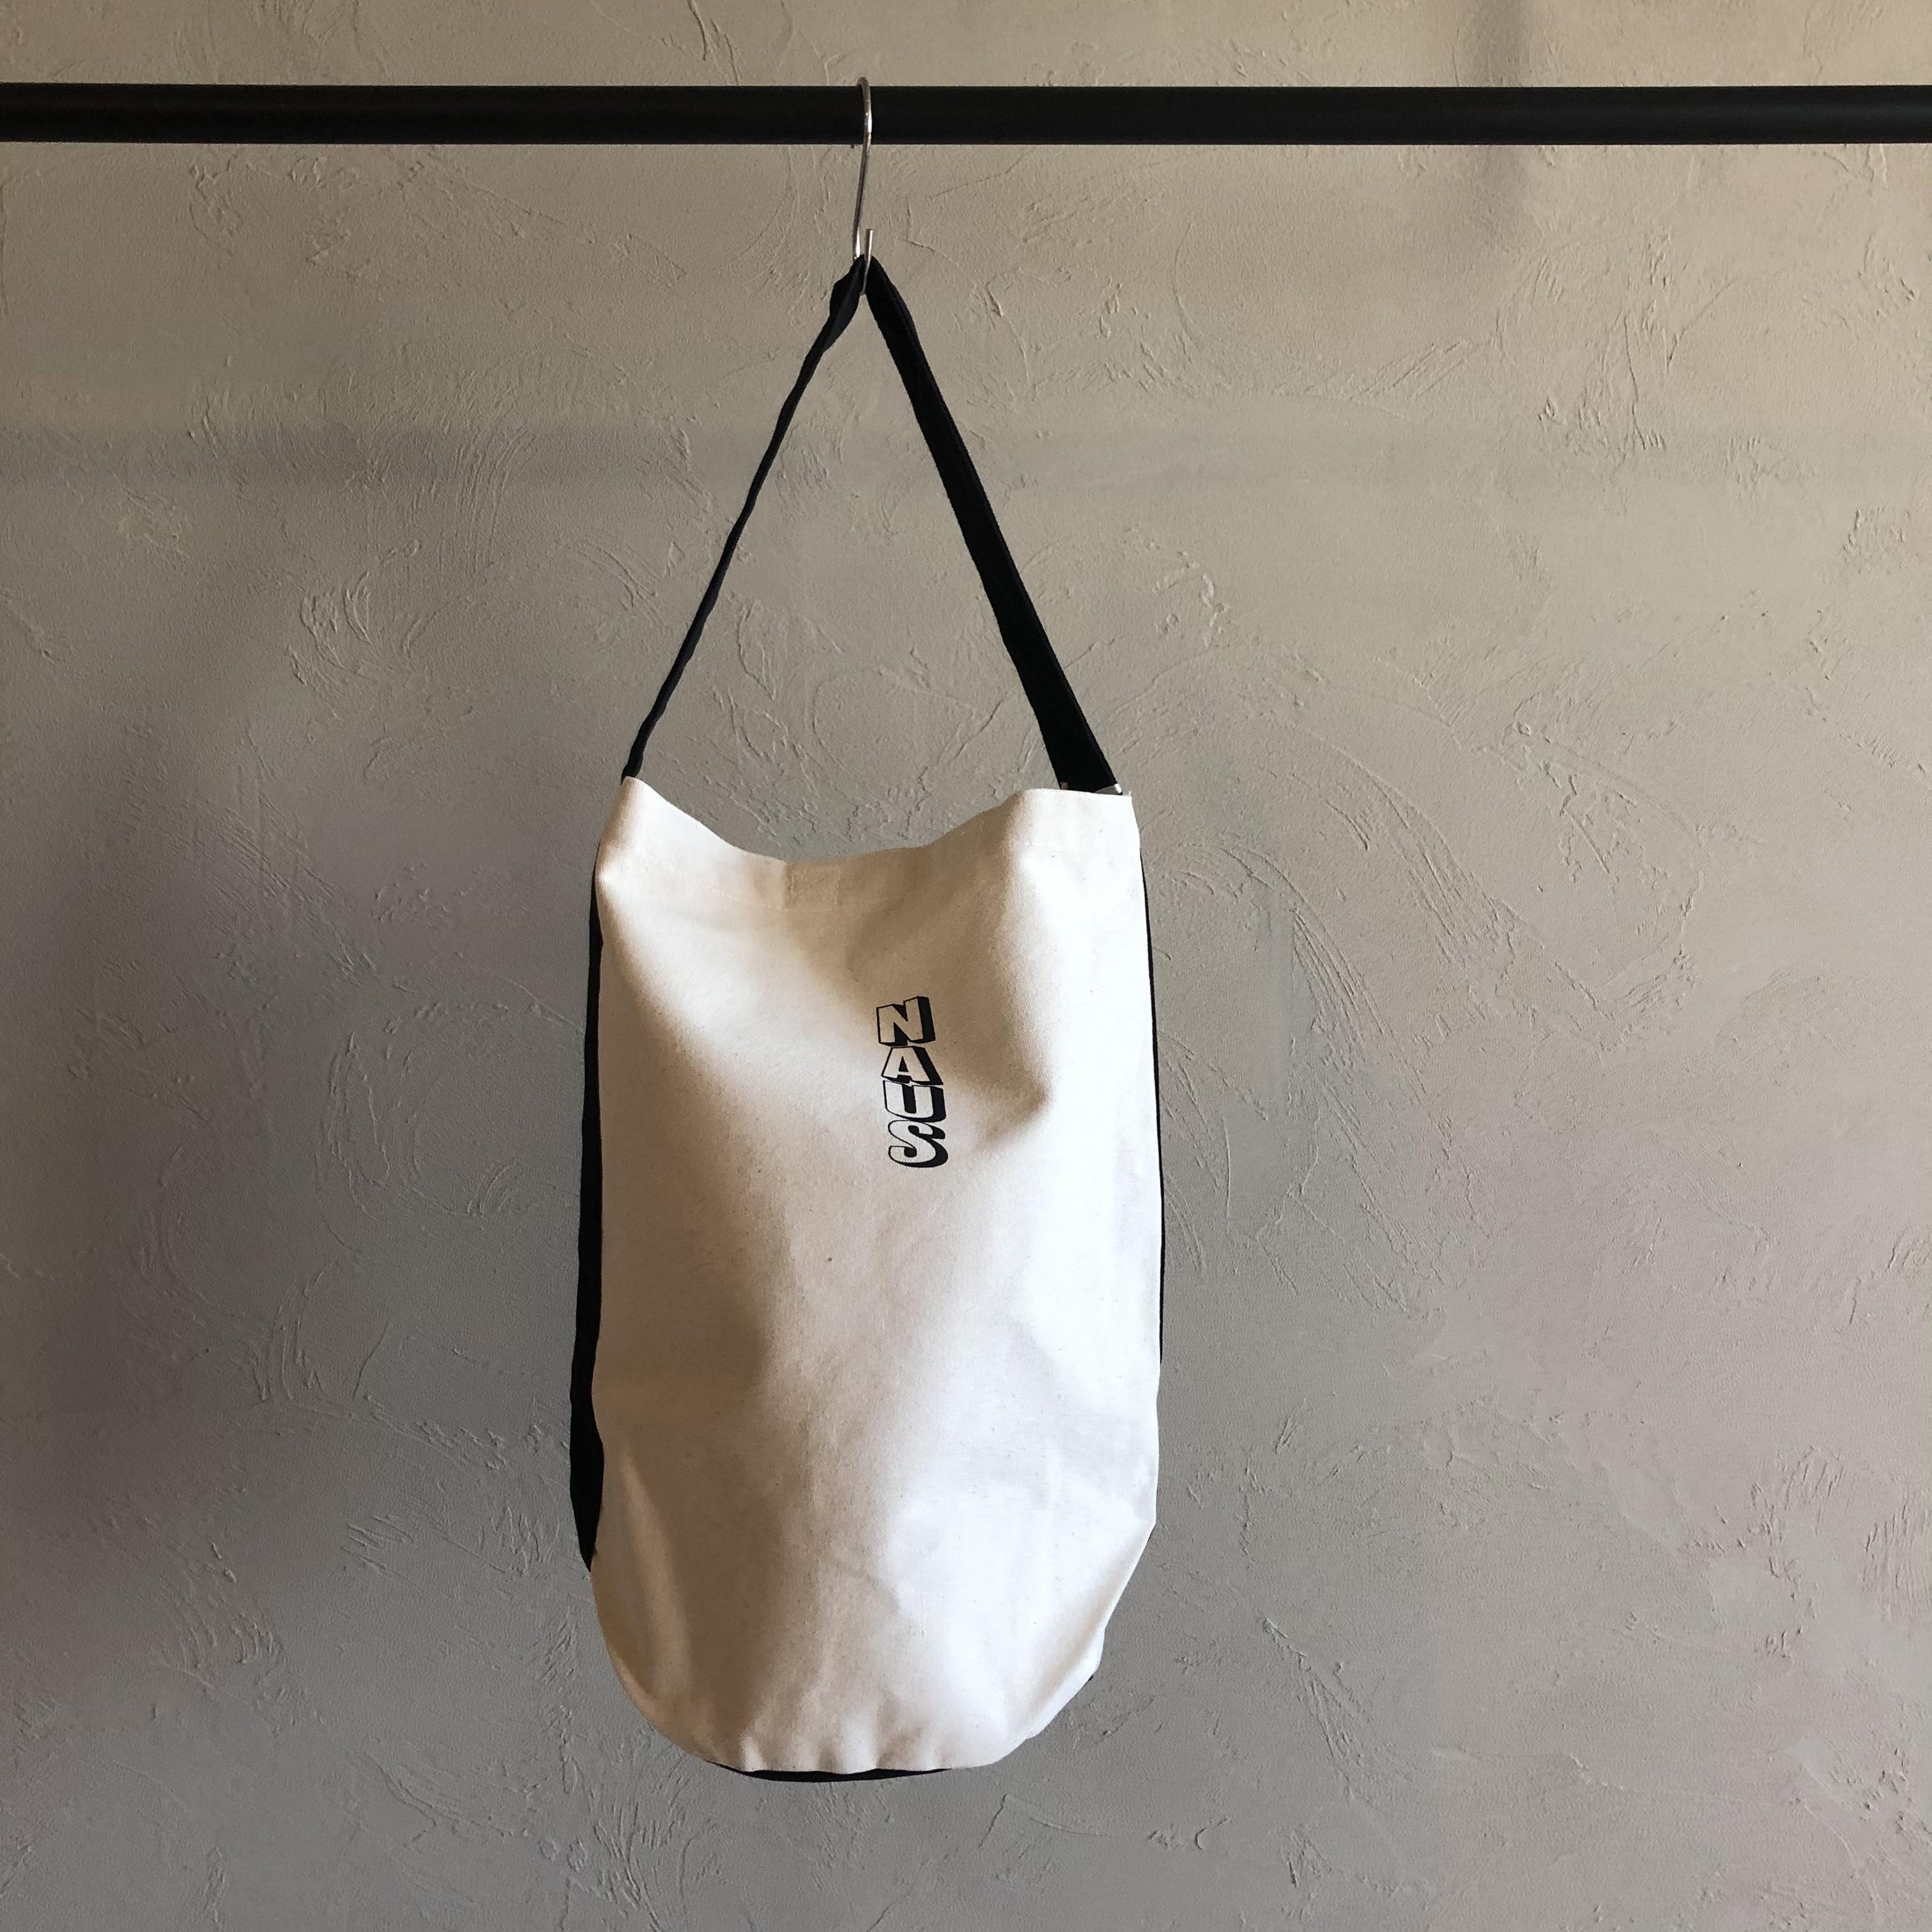 【 NAUS 】- 0038-A -  NAUS BAG